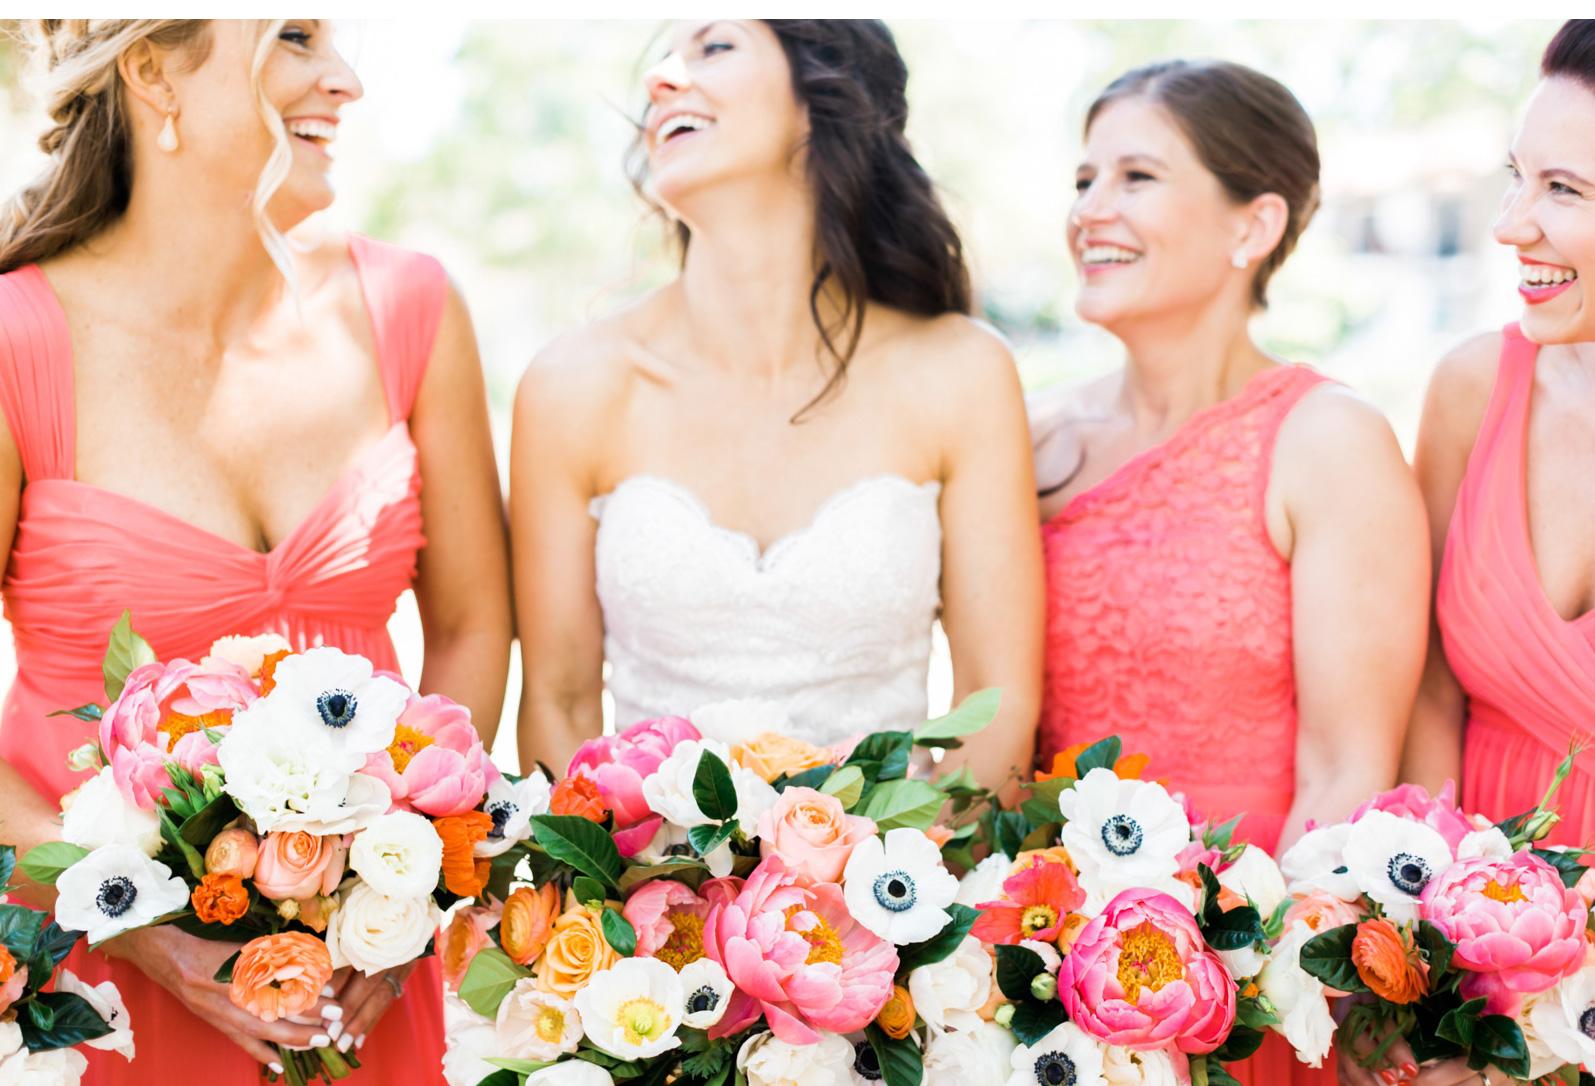 Southern-California-Santa-Barbara-Wedding-Photographer-Natalie-Schutt-Photography_06.jpg